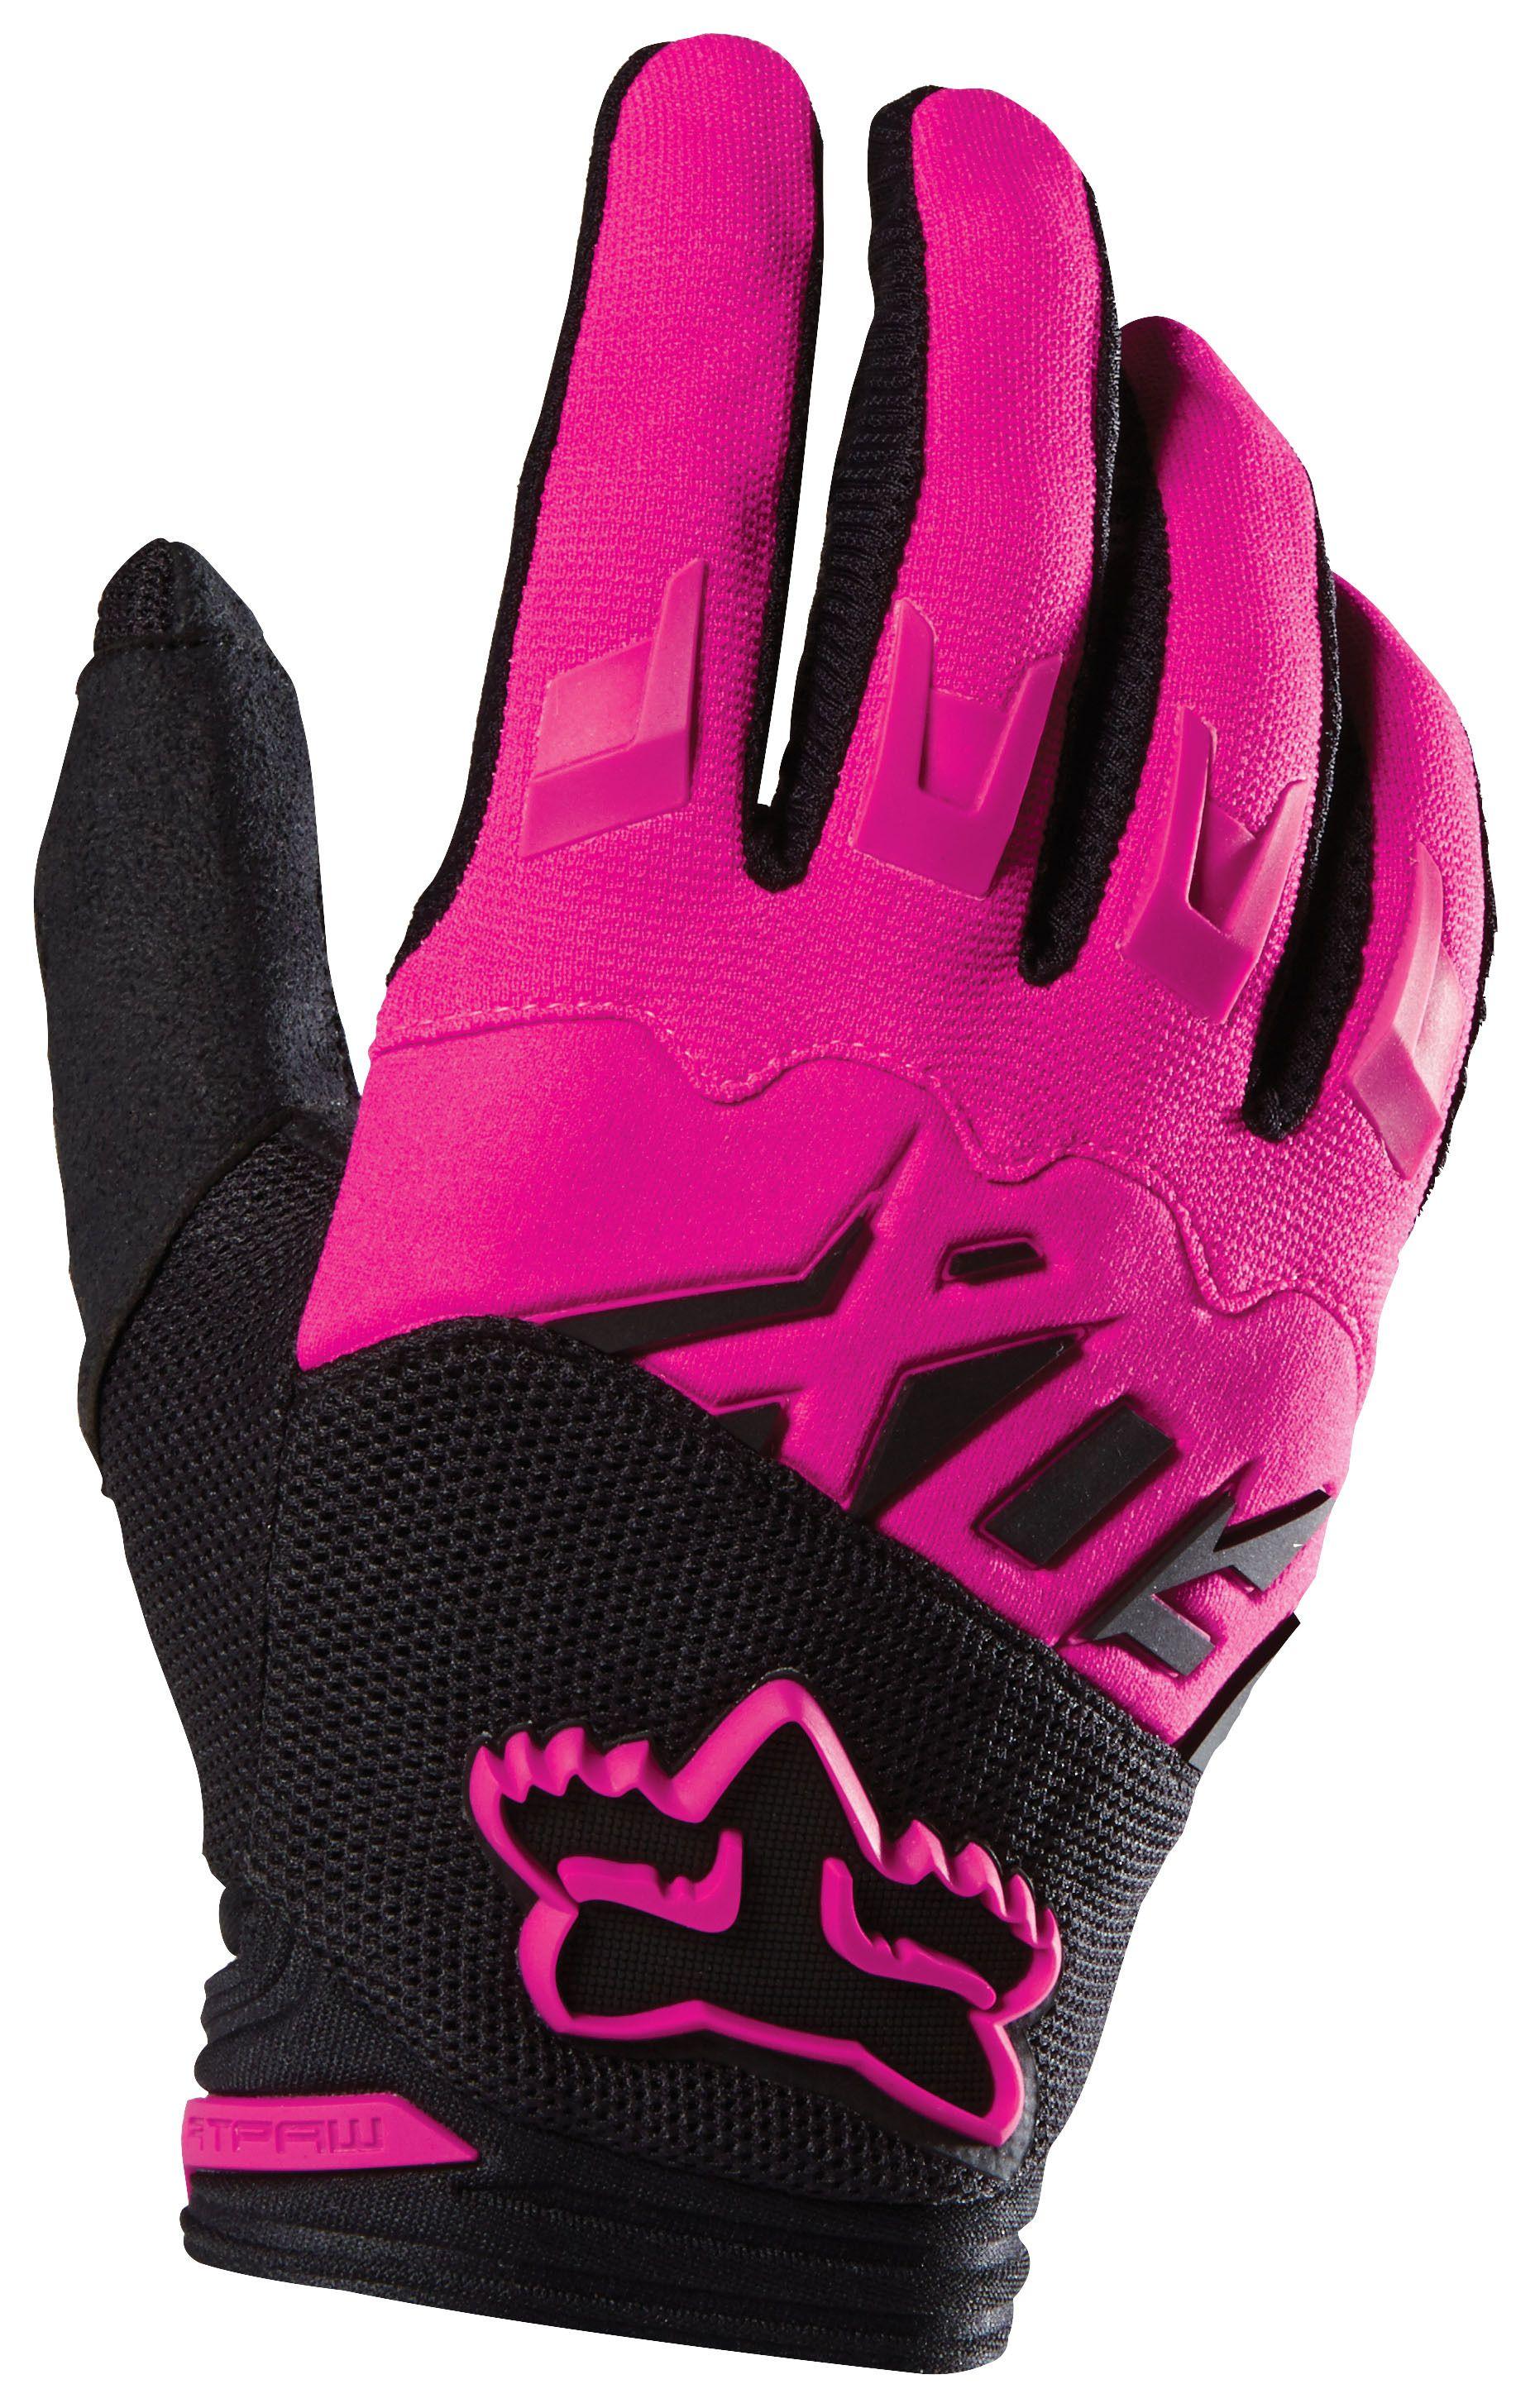 Fox Racing Dirtpaw Race Gloves 30 7 48 Off Revzilla